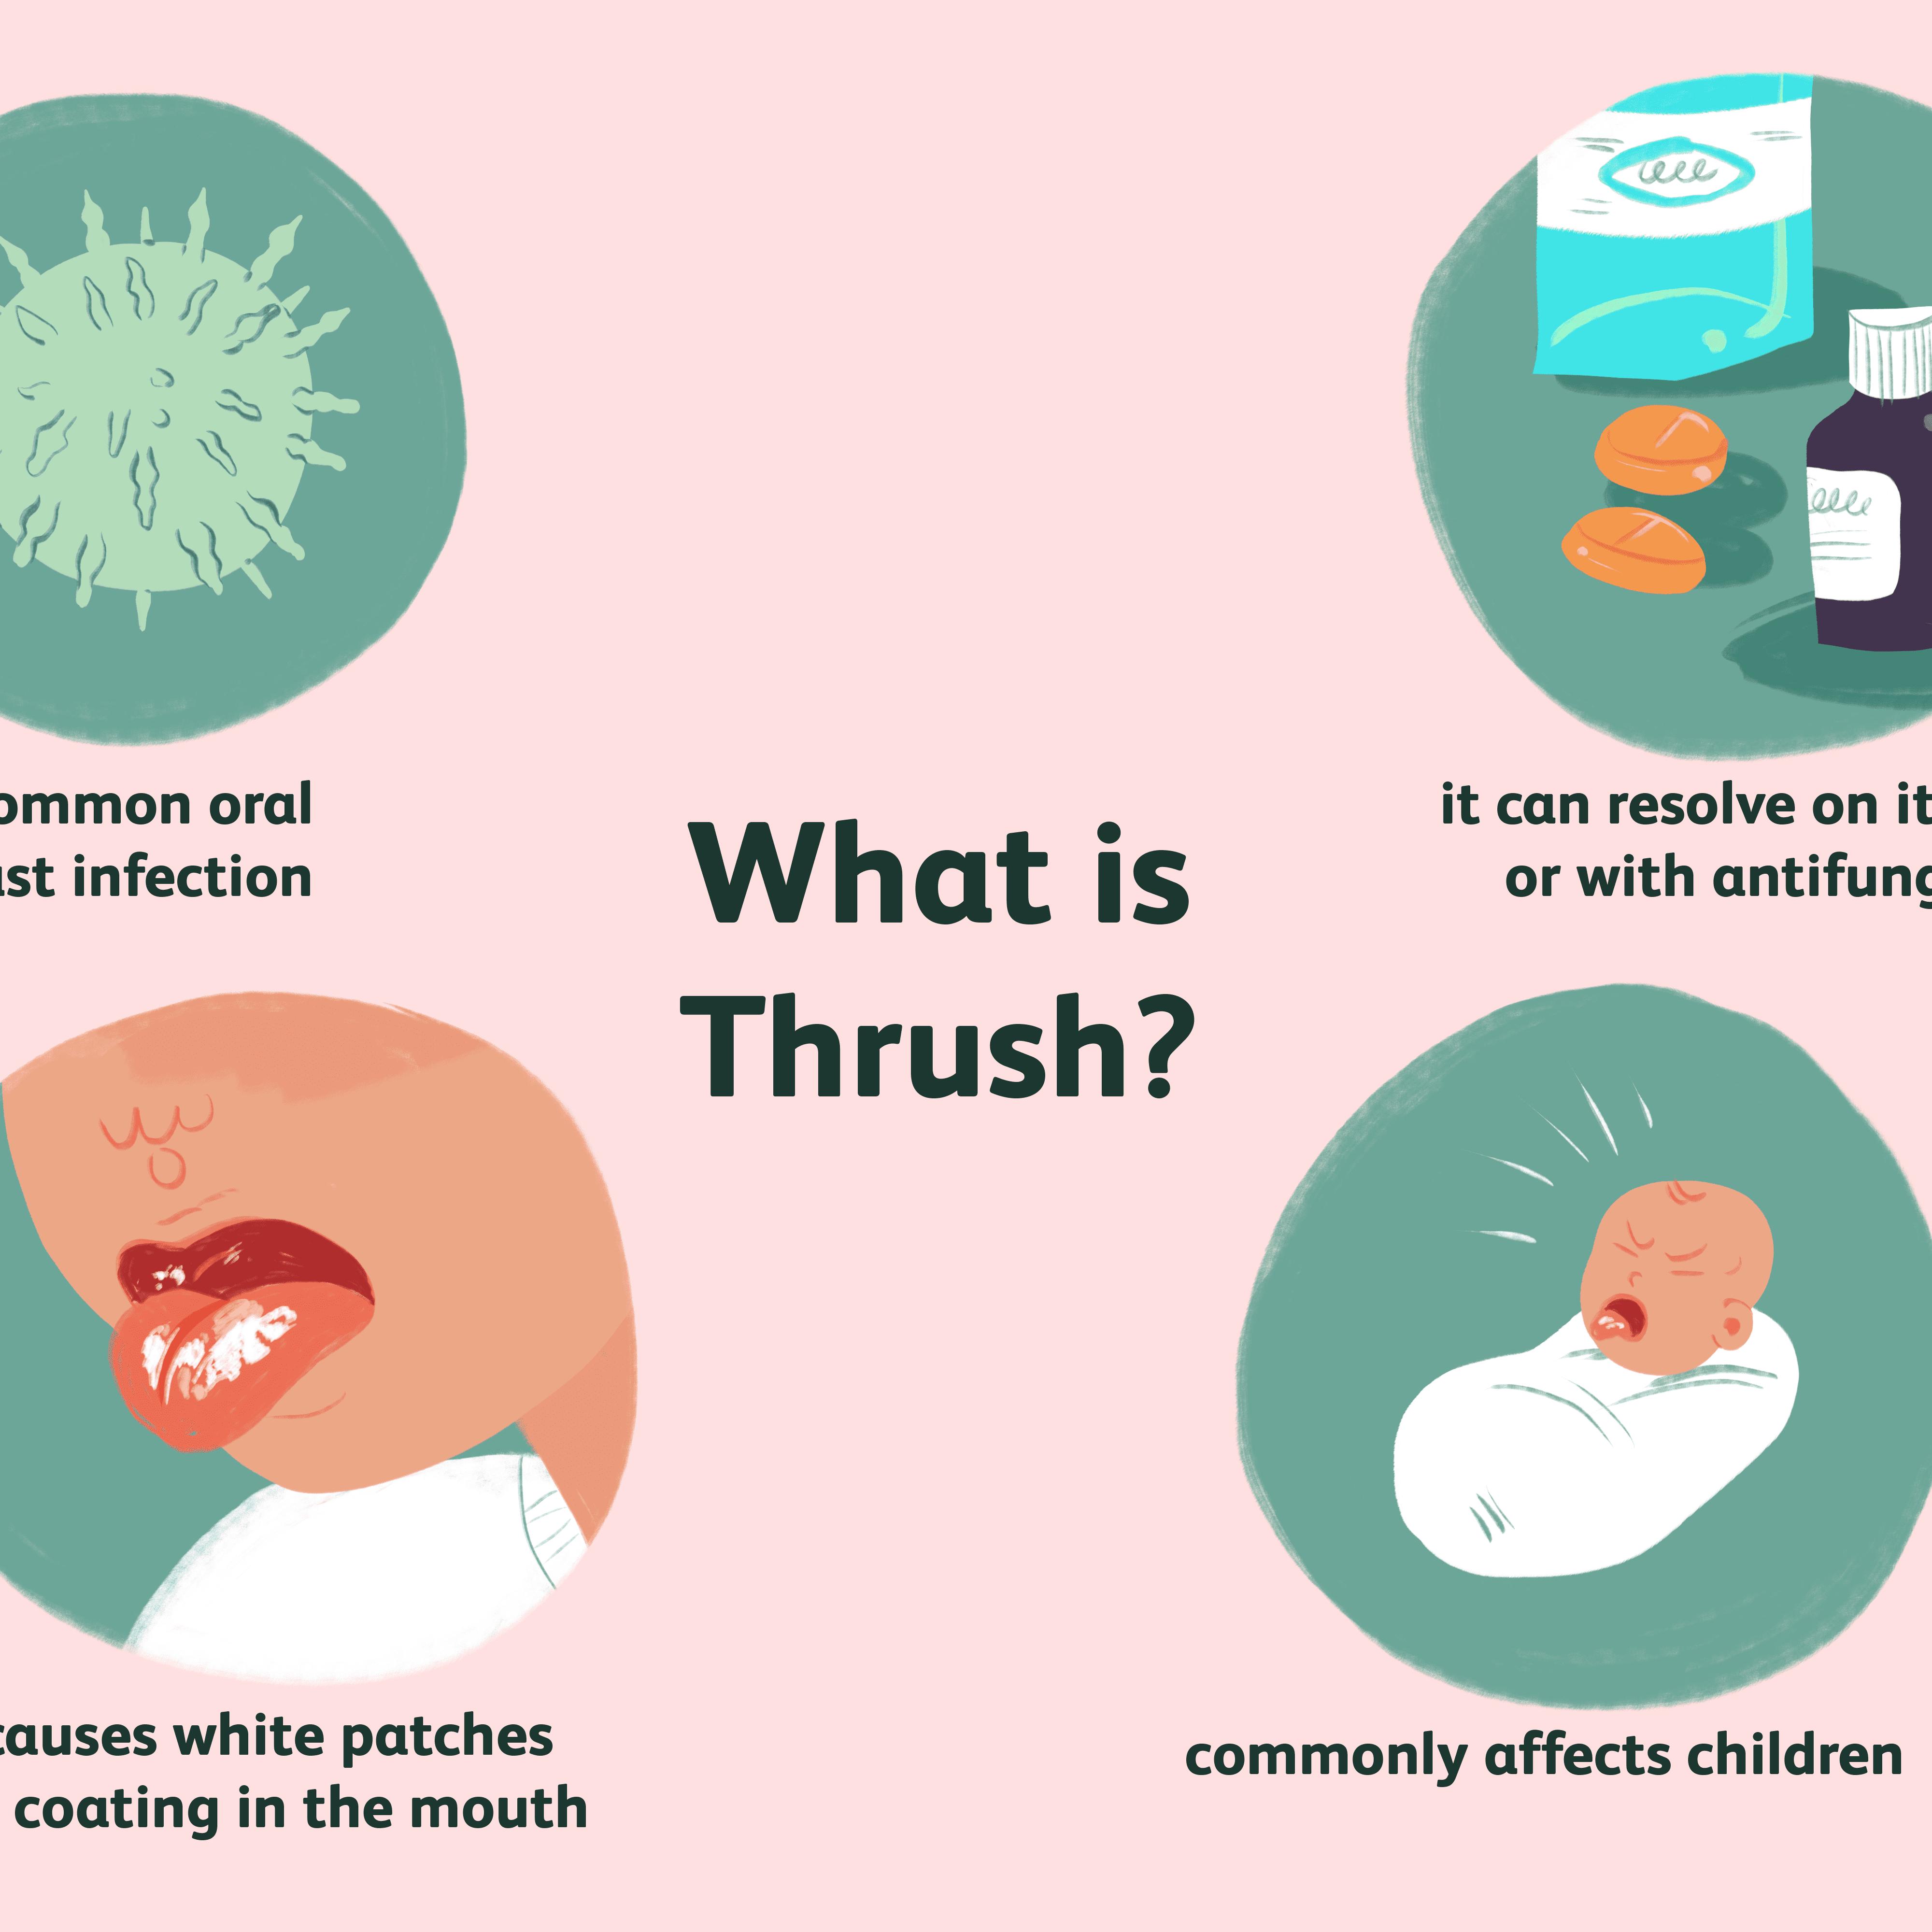 moniliasis thrush causes